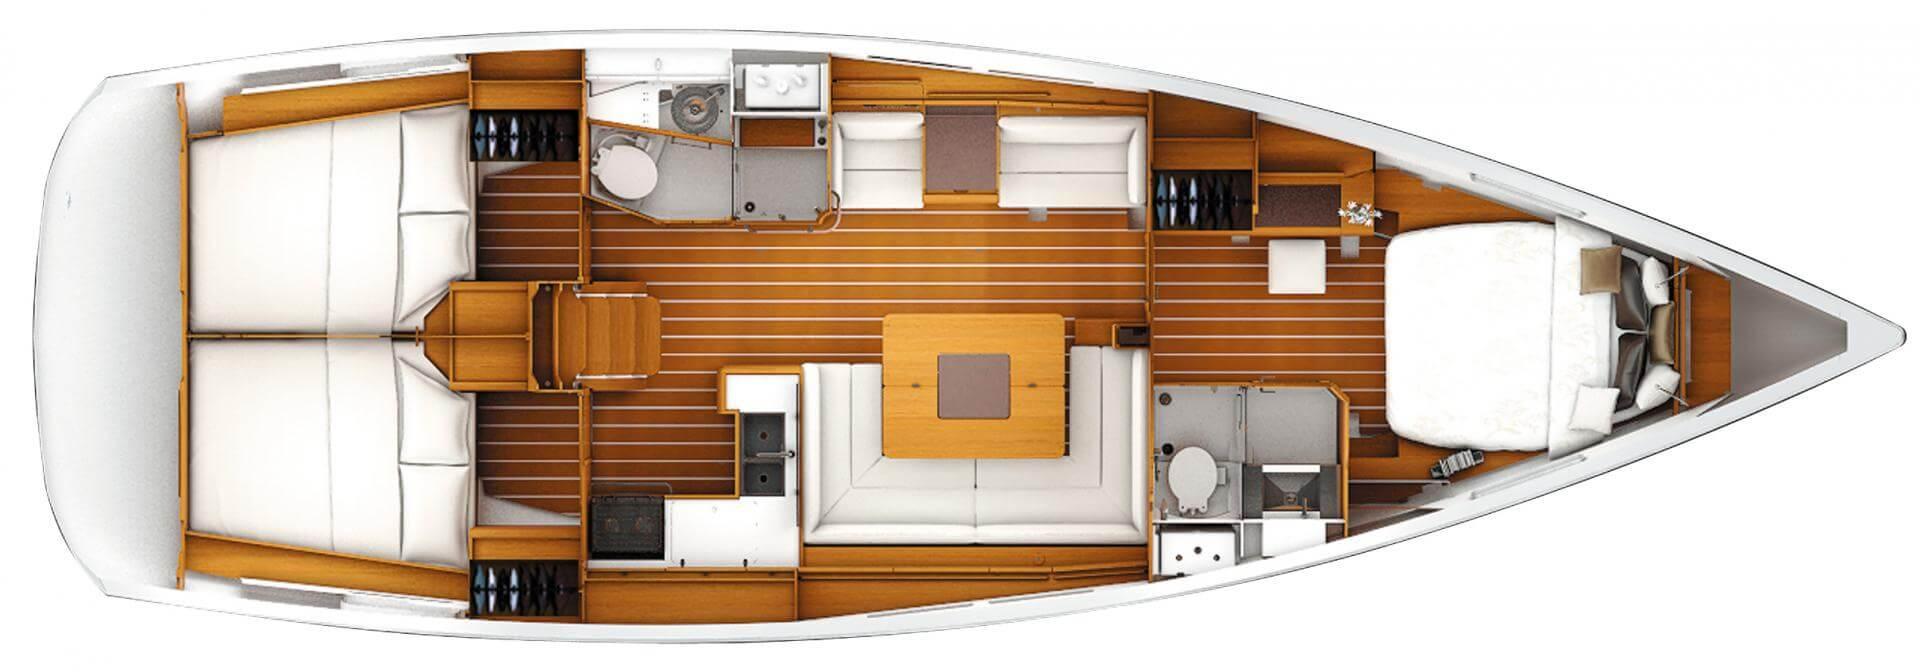 Barca a vela interni